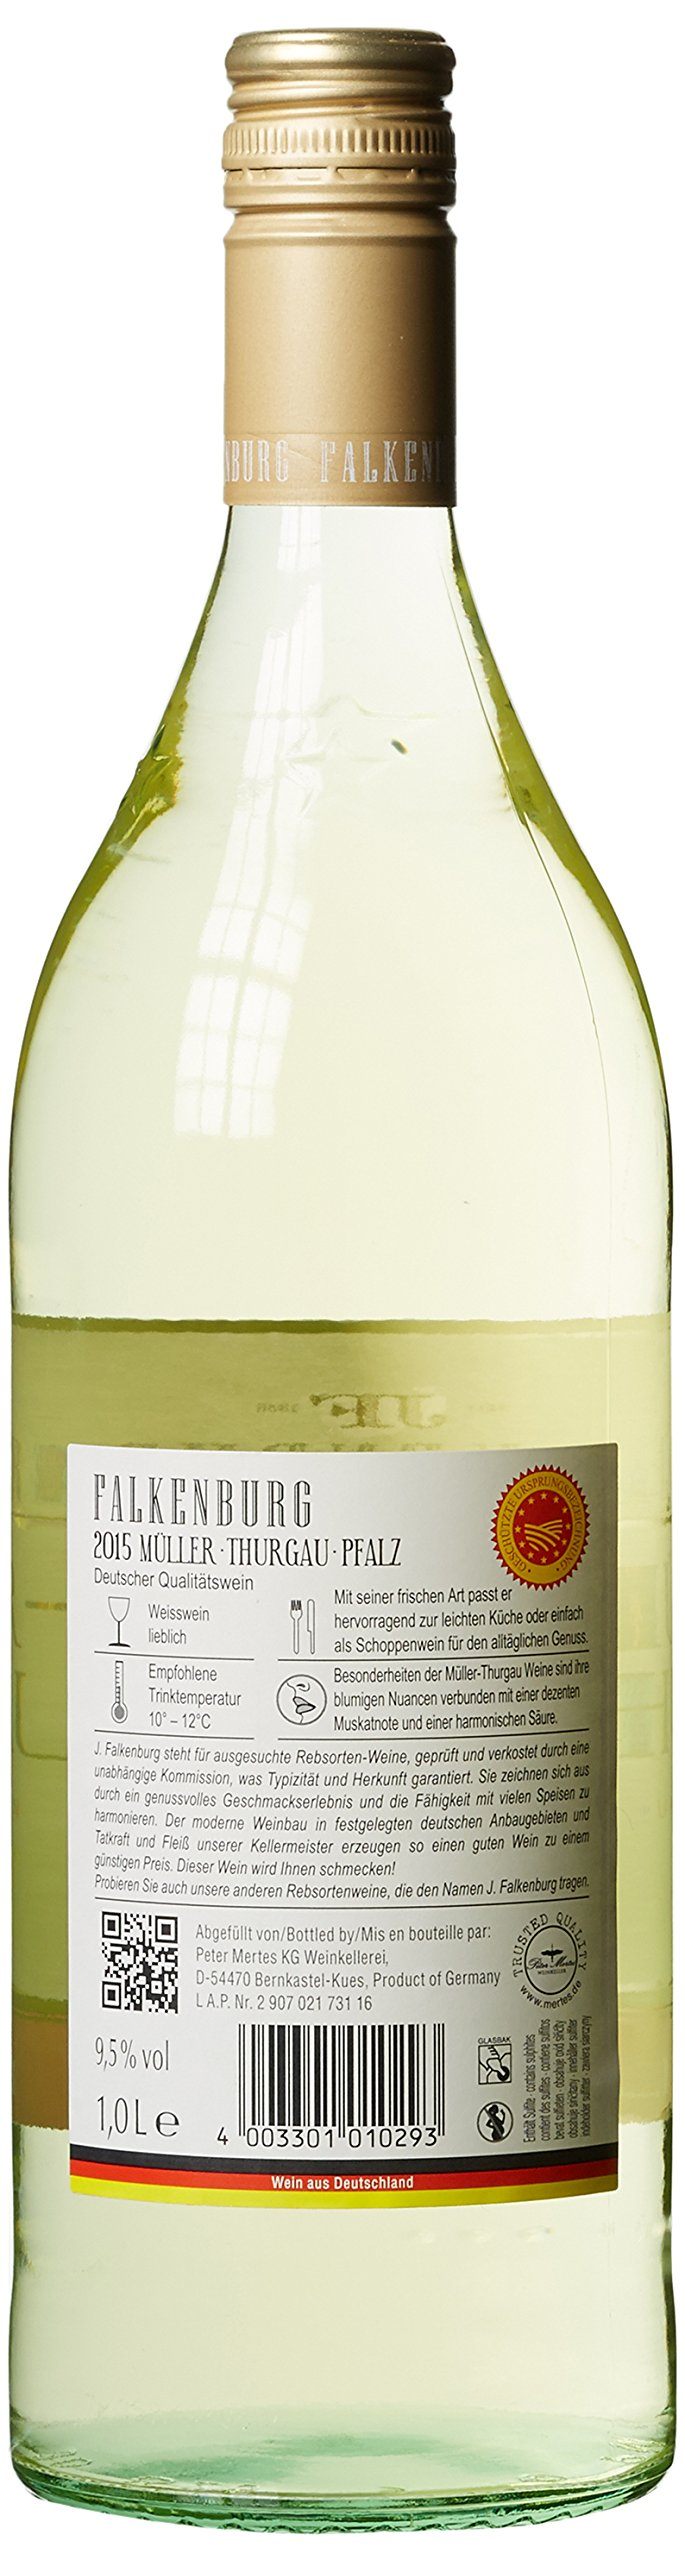 Falkenburg-Mller-Thurgau-Lieblich-6-x-1-l